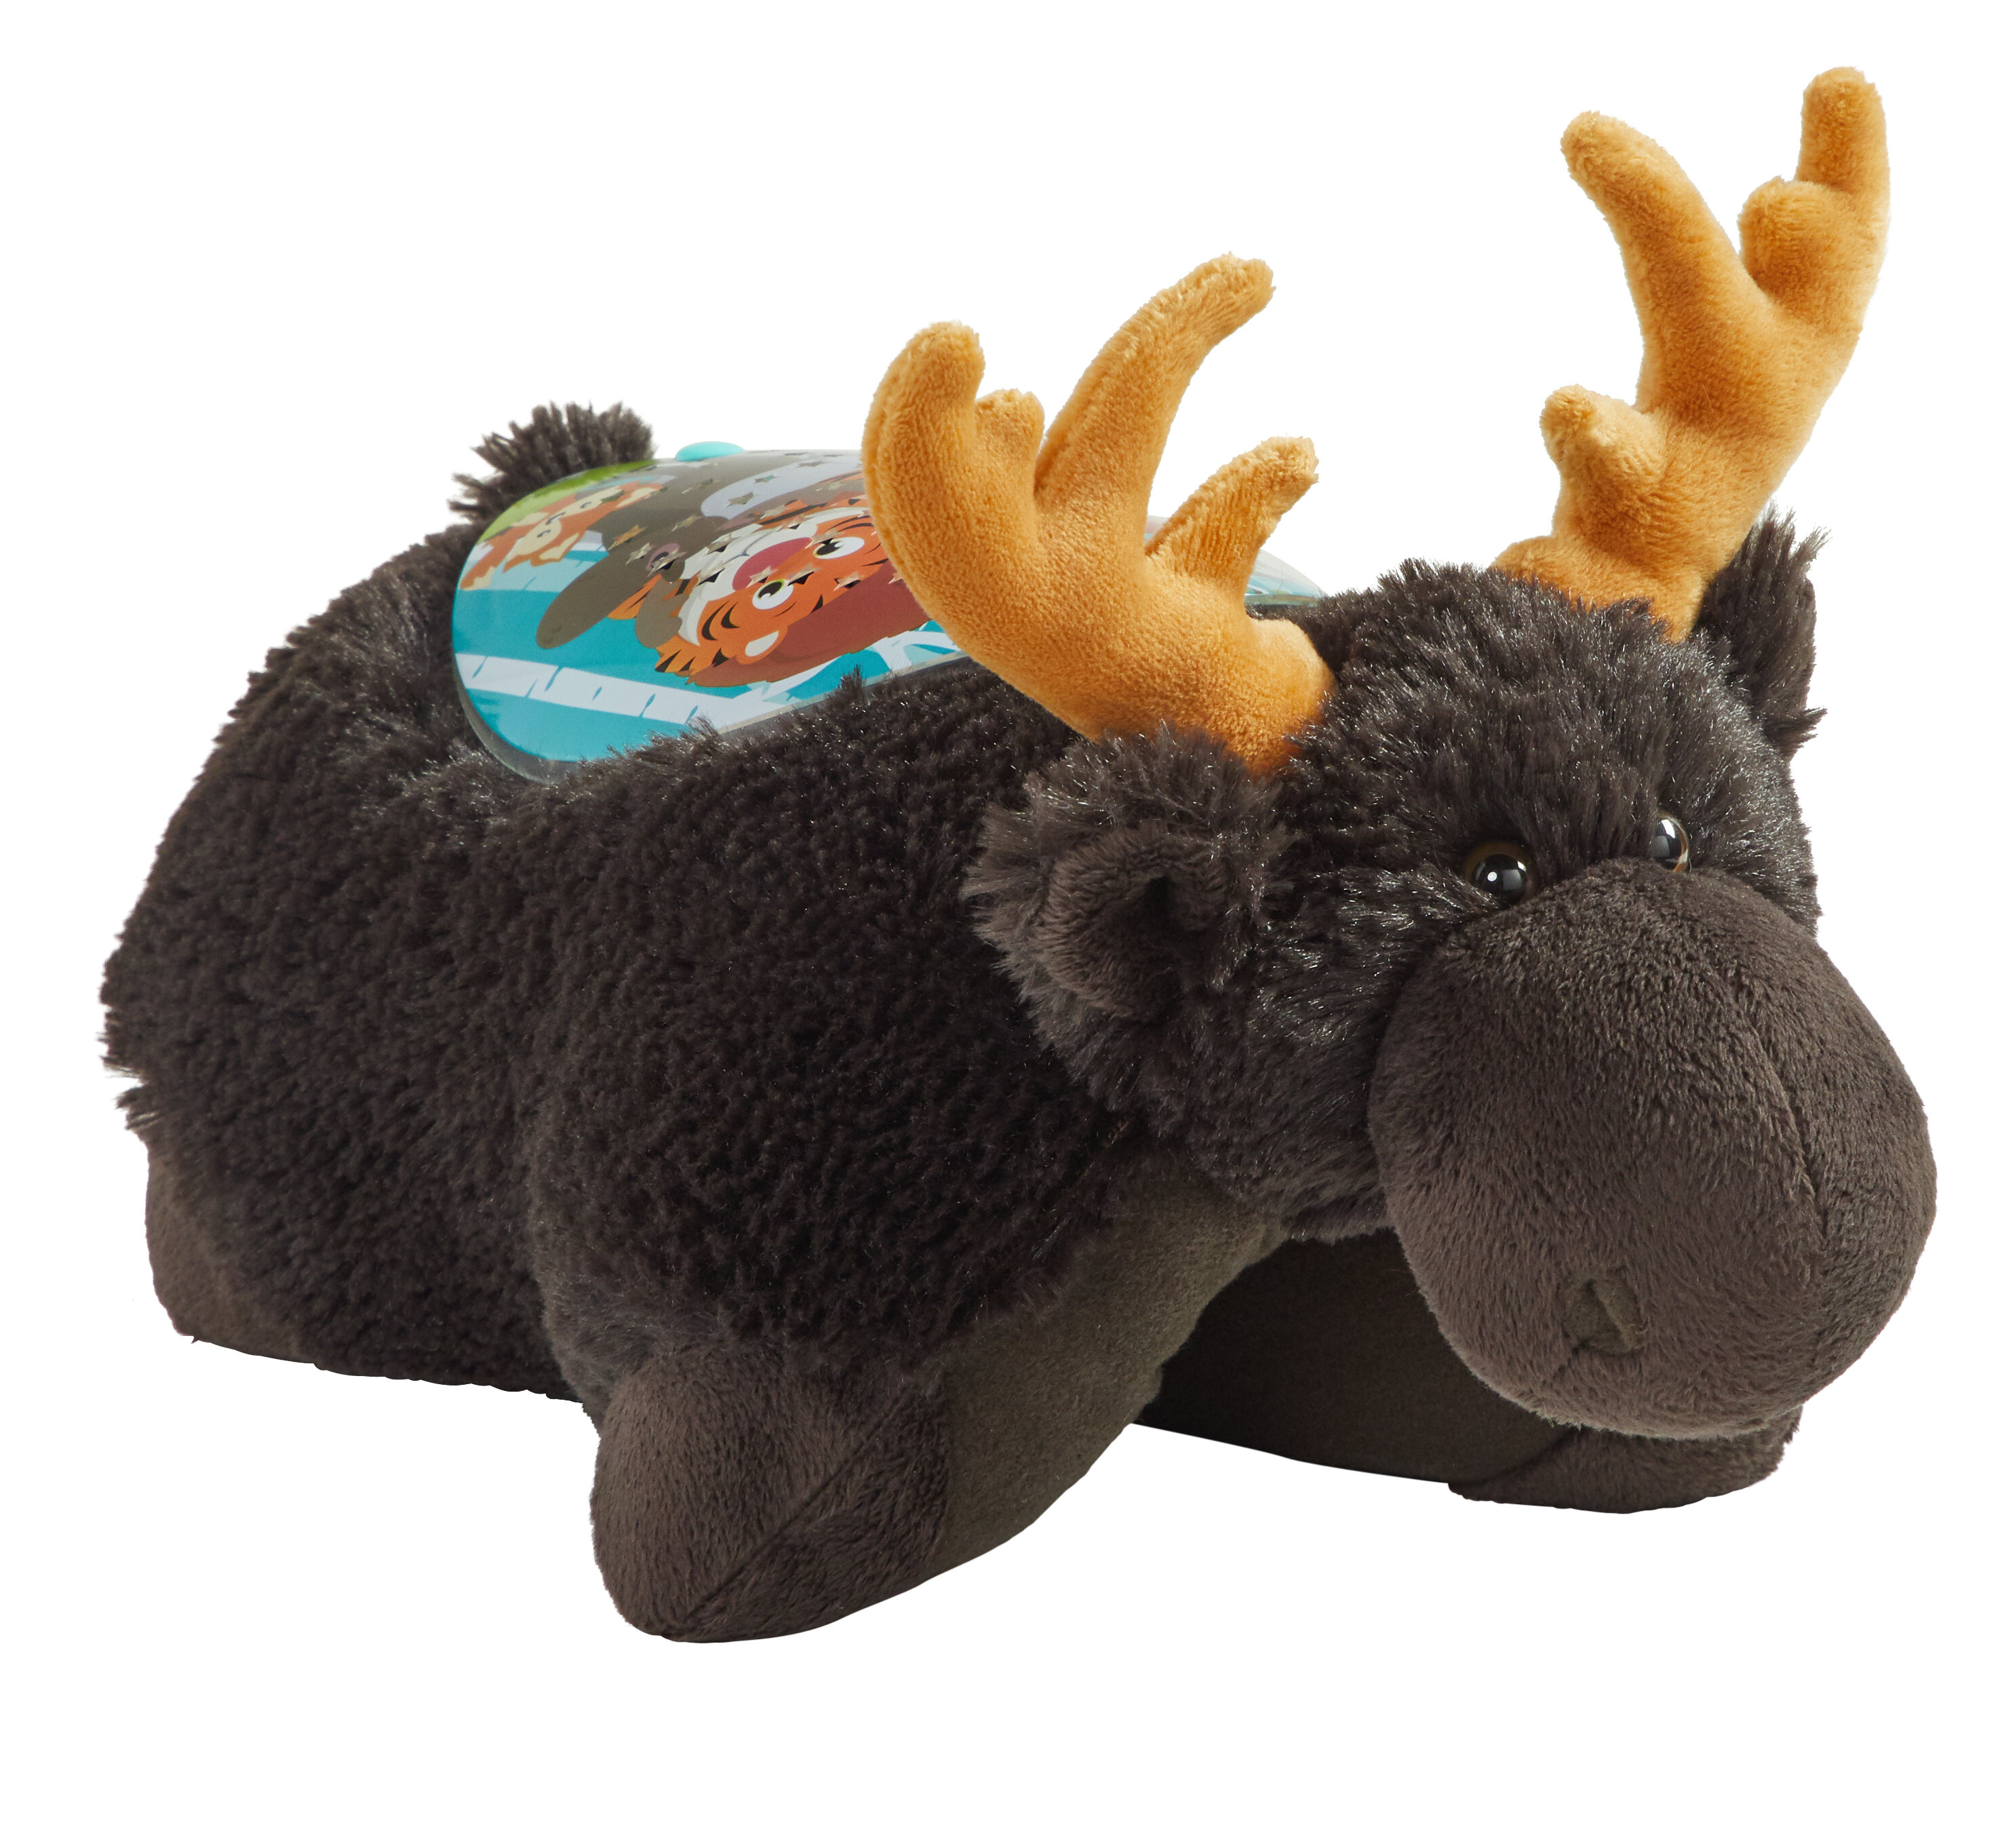 Pillowpets Sleeptime Lite Wild Moose Plush Night Light Reviews